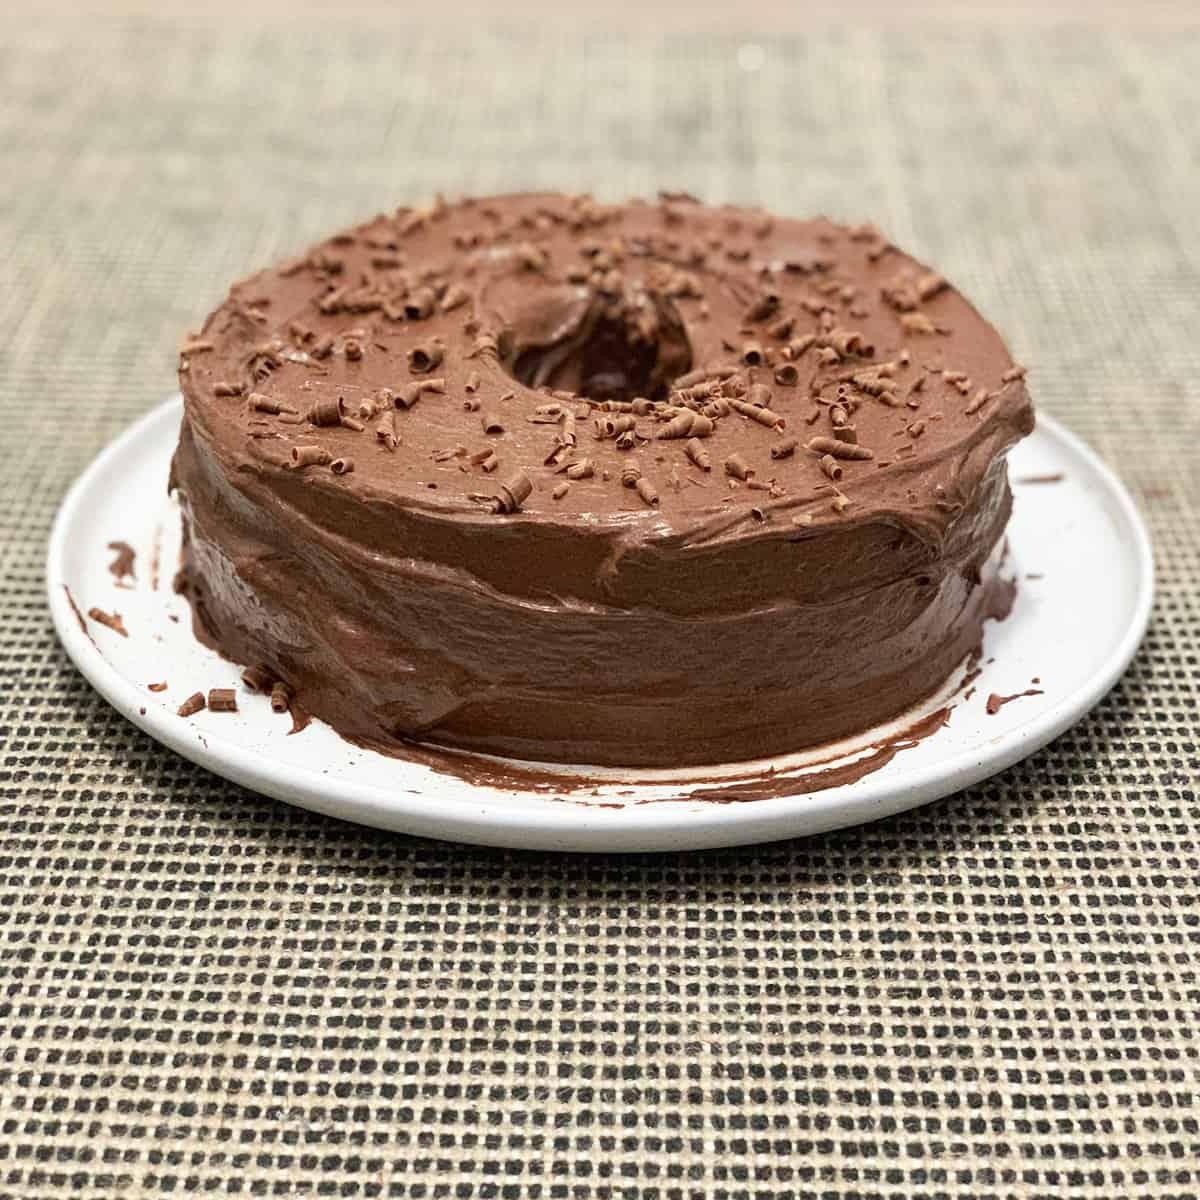 Whole chocolate zucchini cake on a white plate